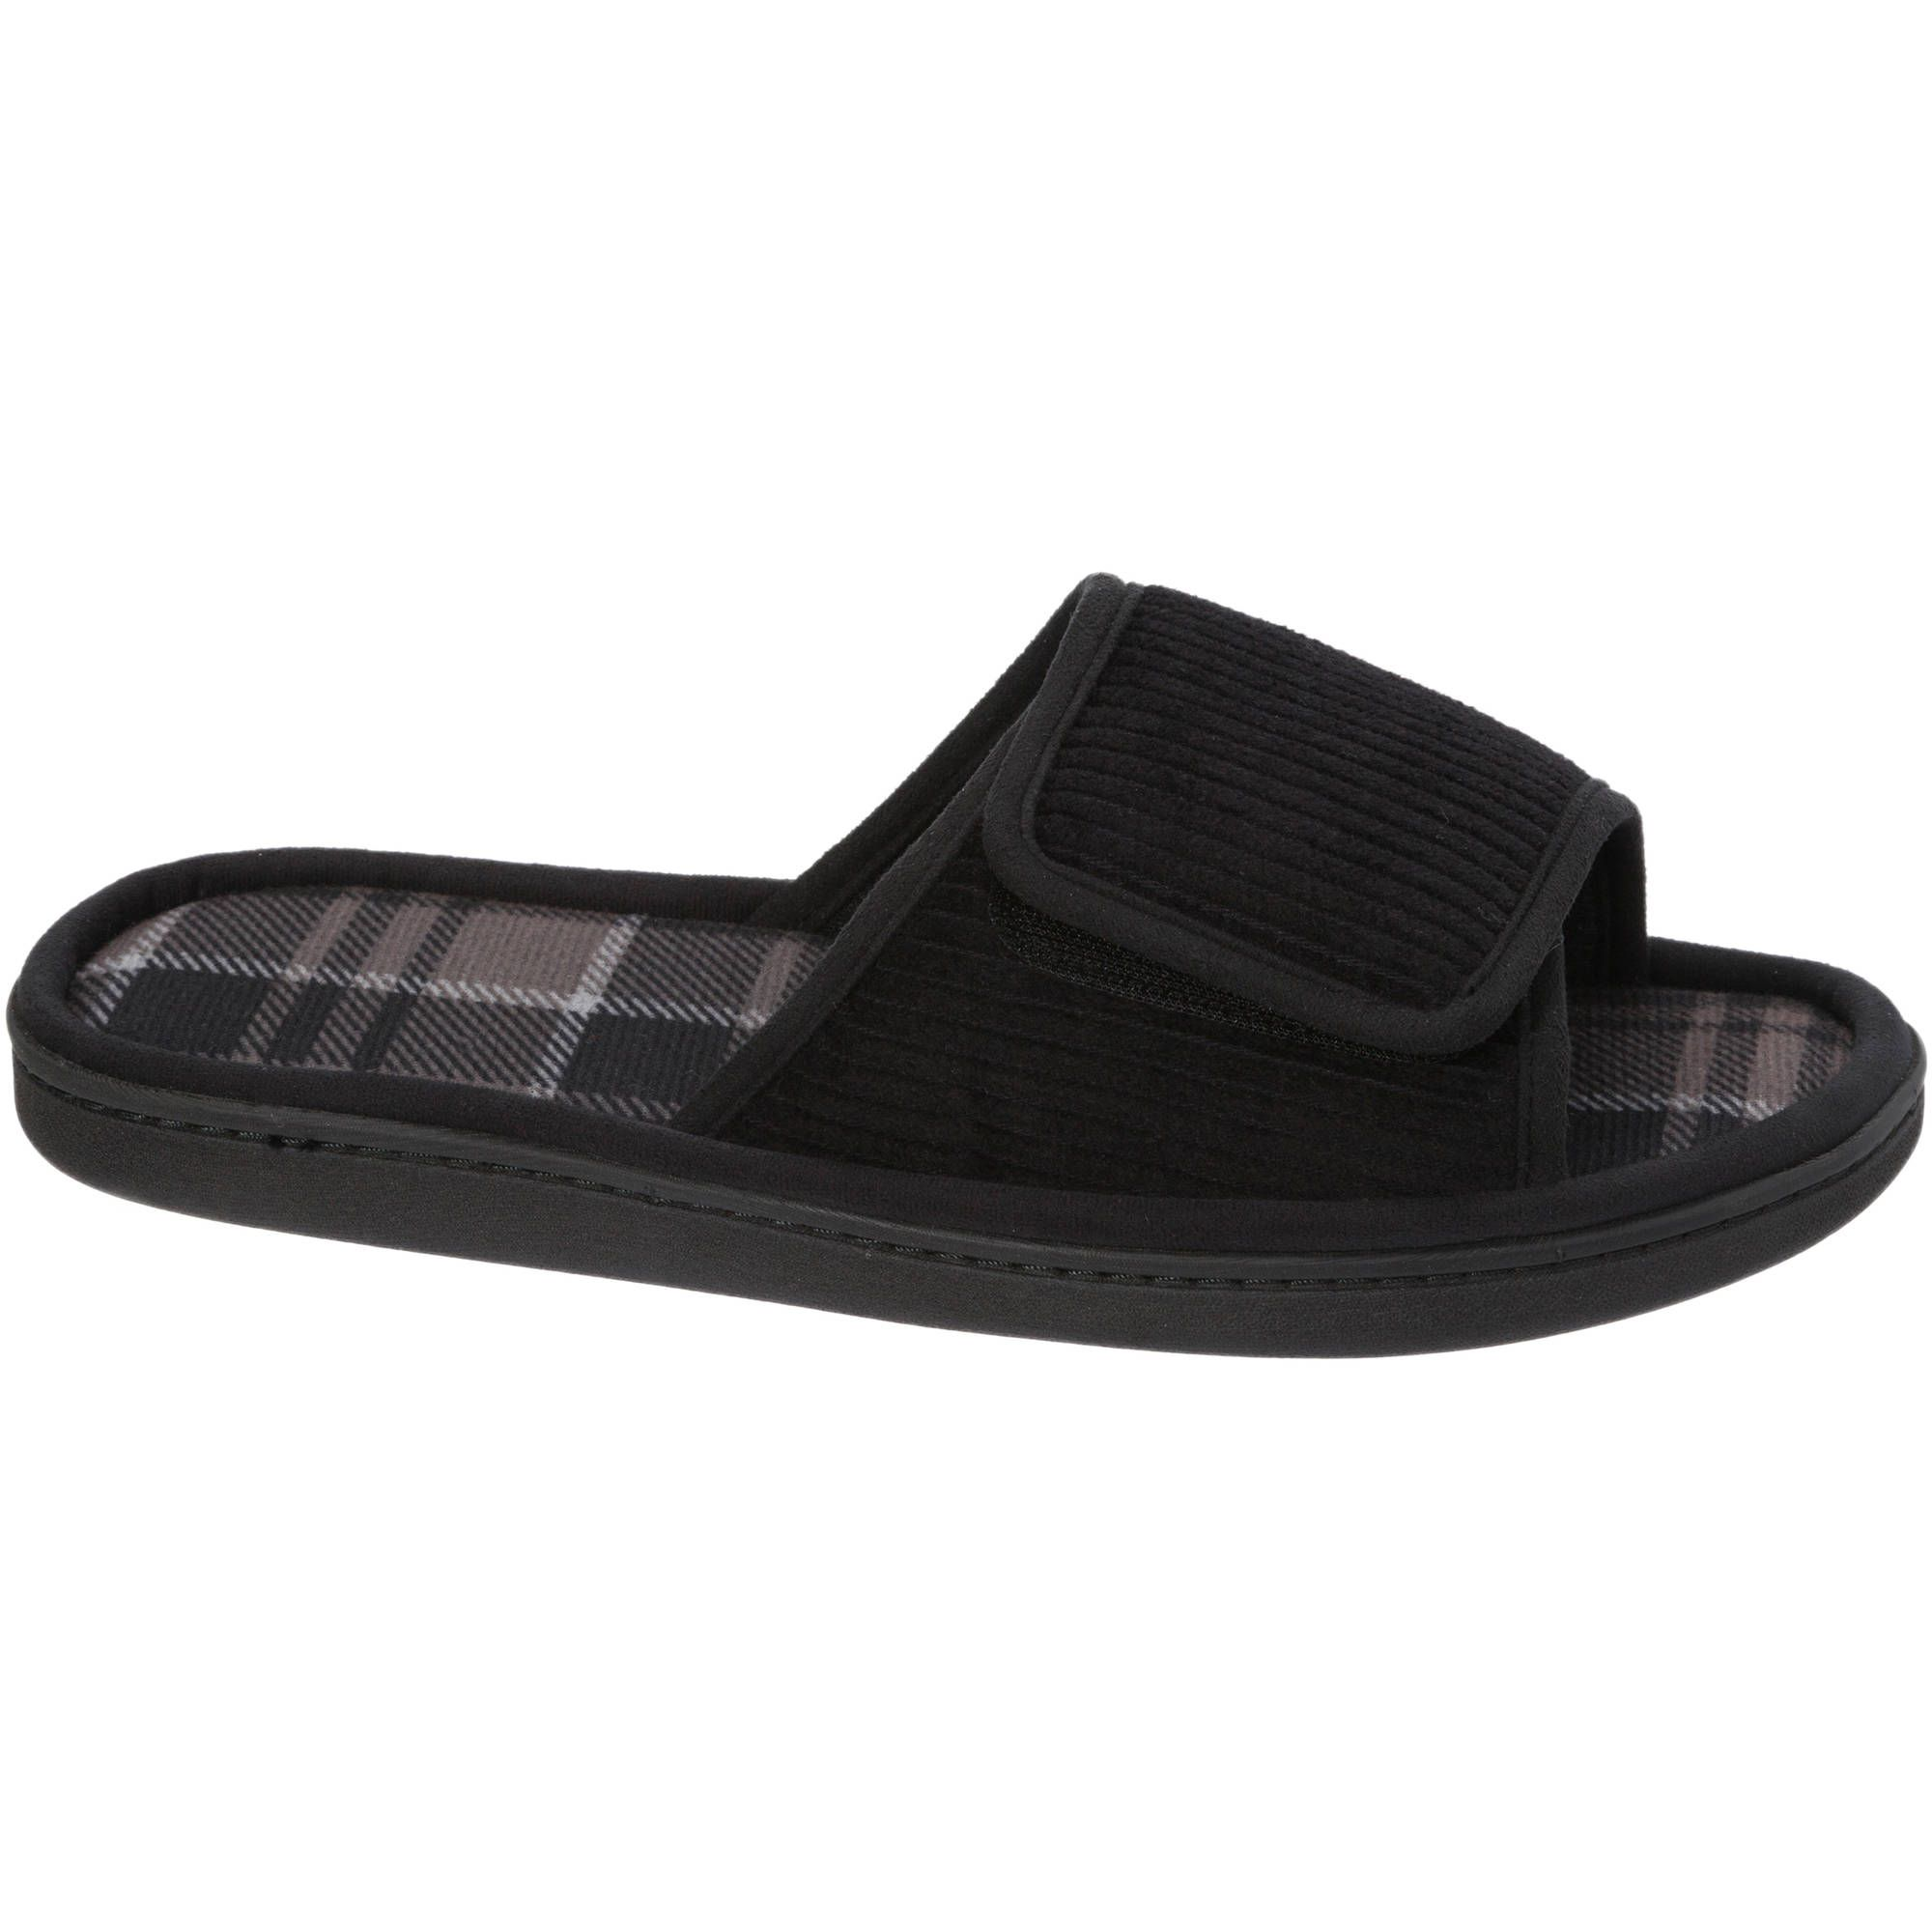 dearfoams women velour clog slipper shoes walmart men slide | Home ...